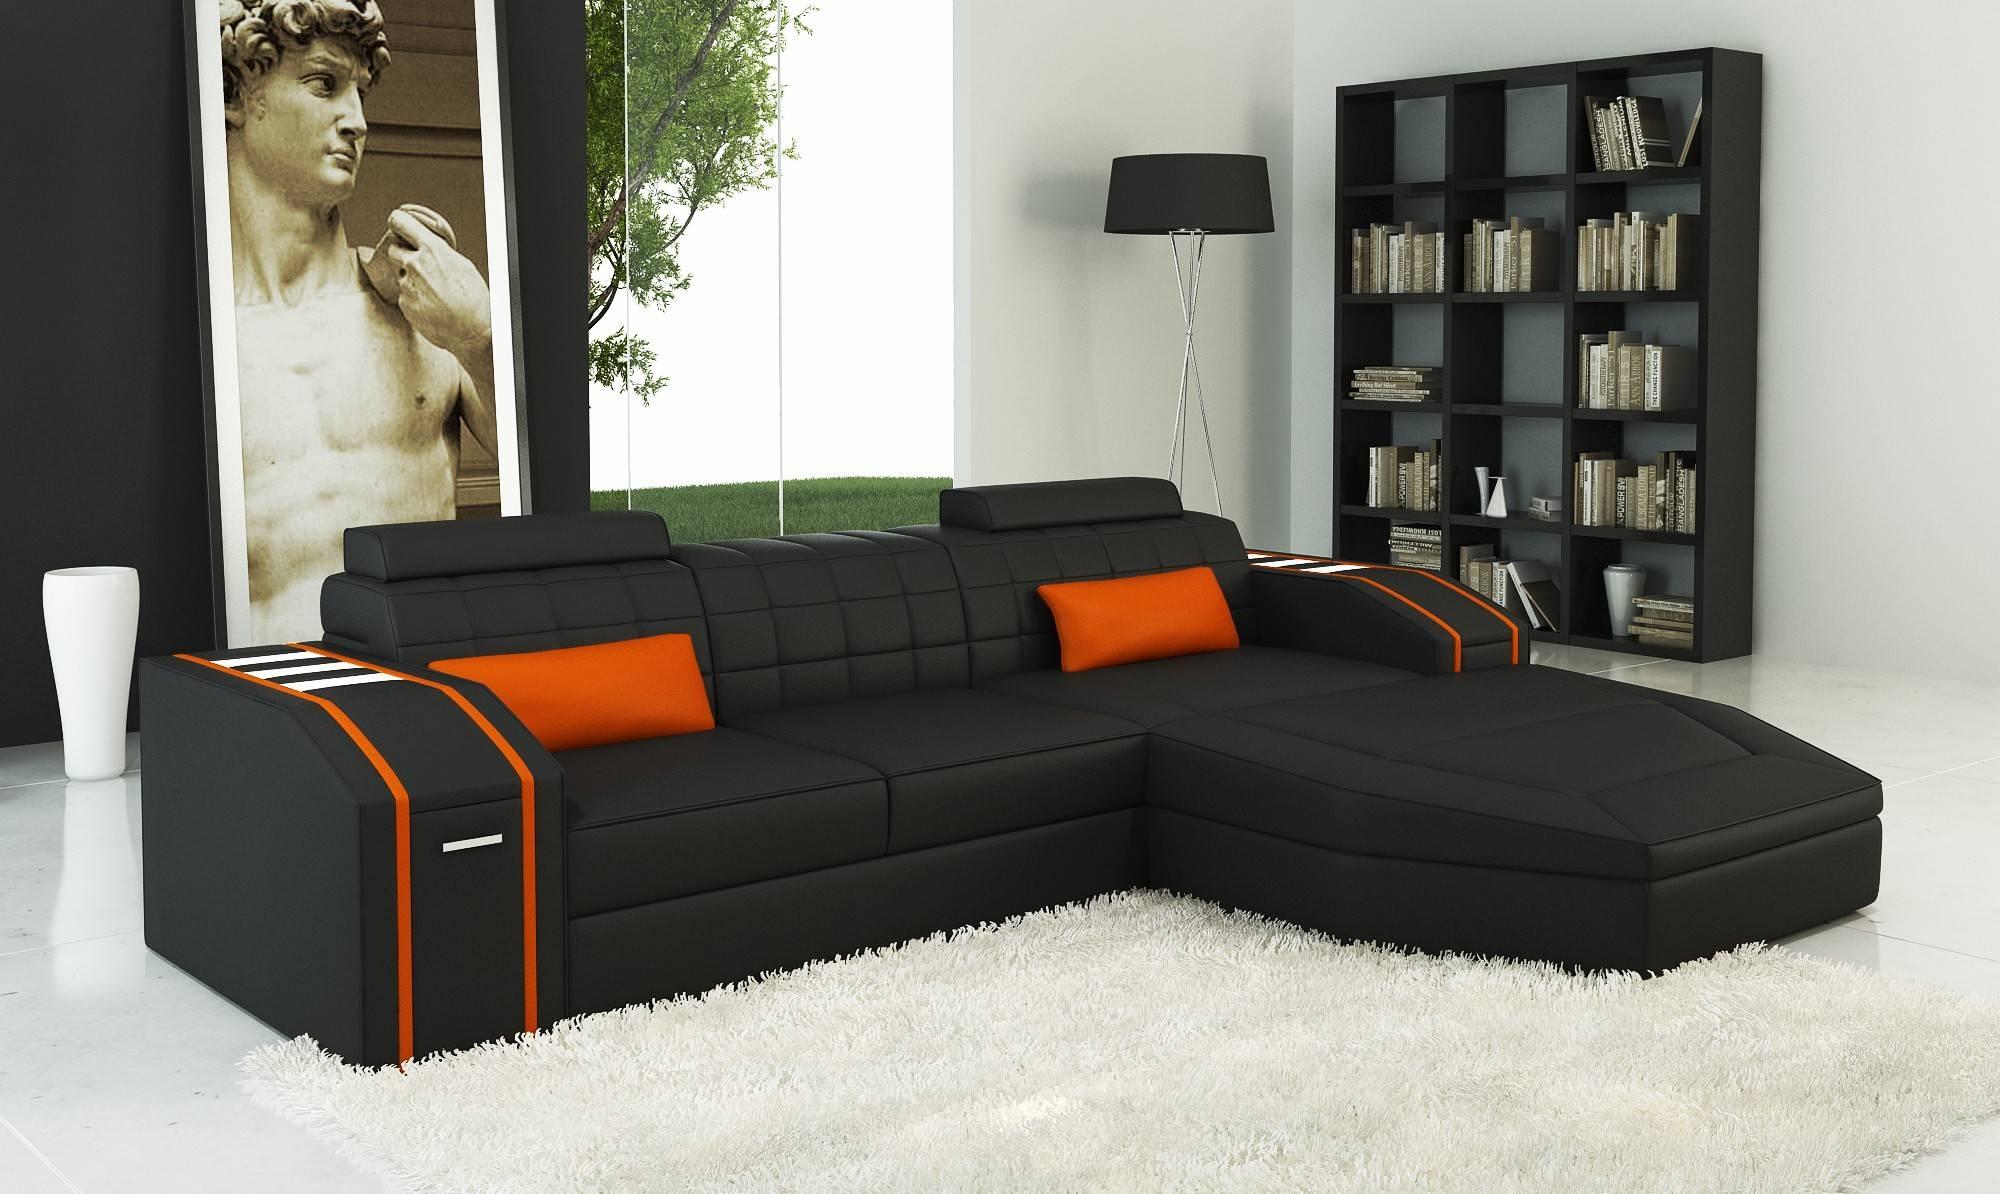 2019 Latest Burnt Orange Leather Sectional Sofas